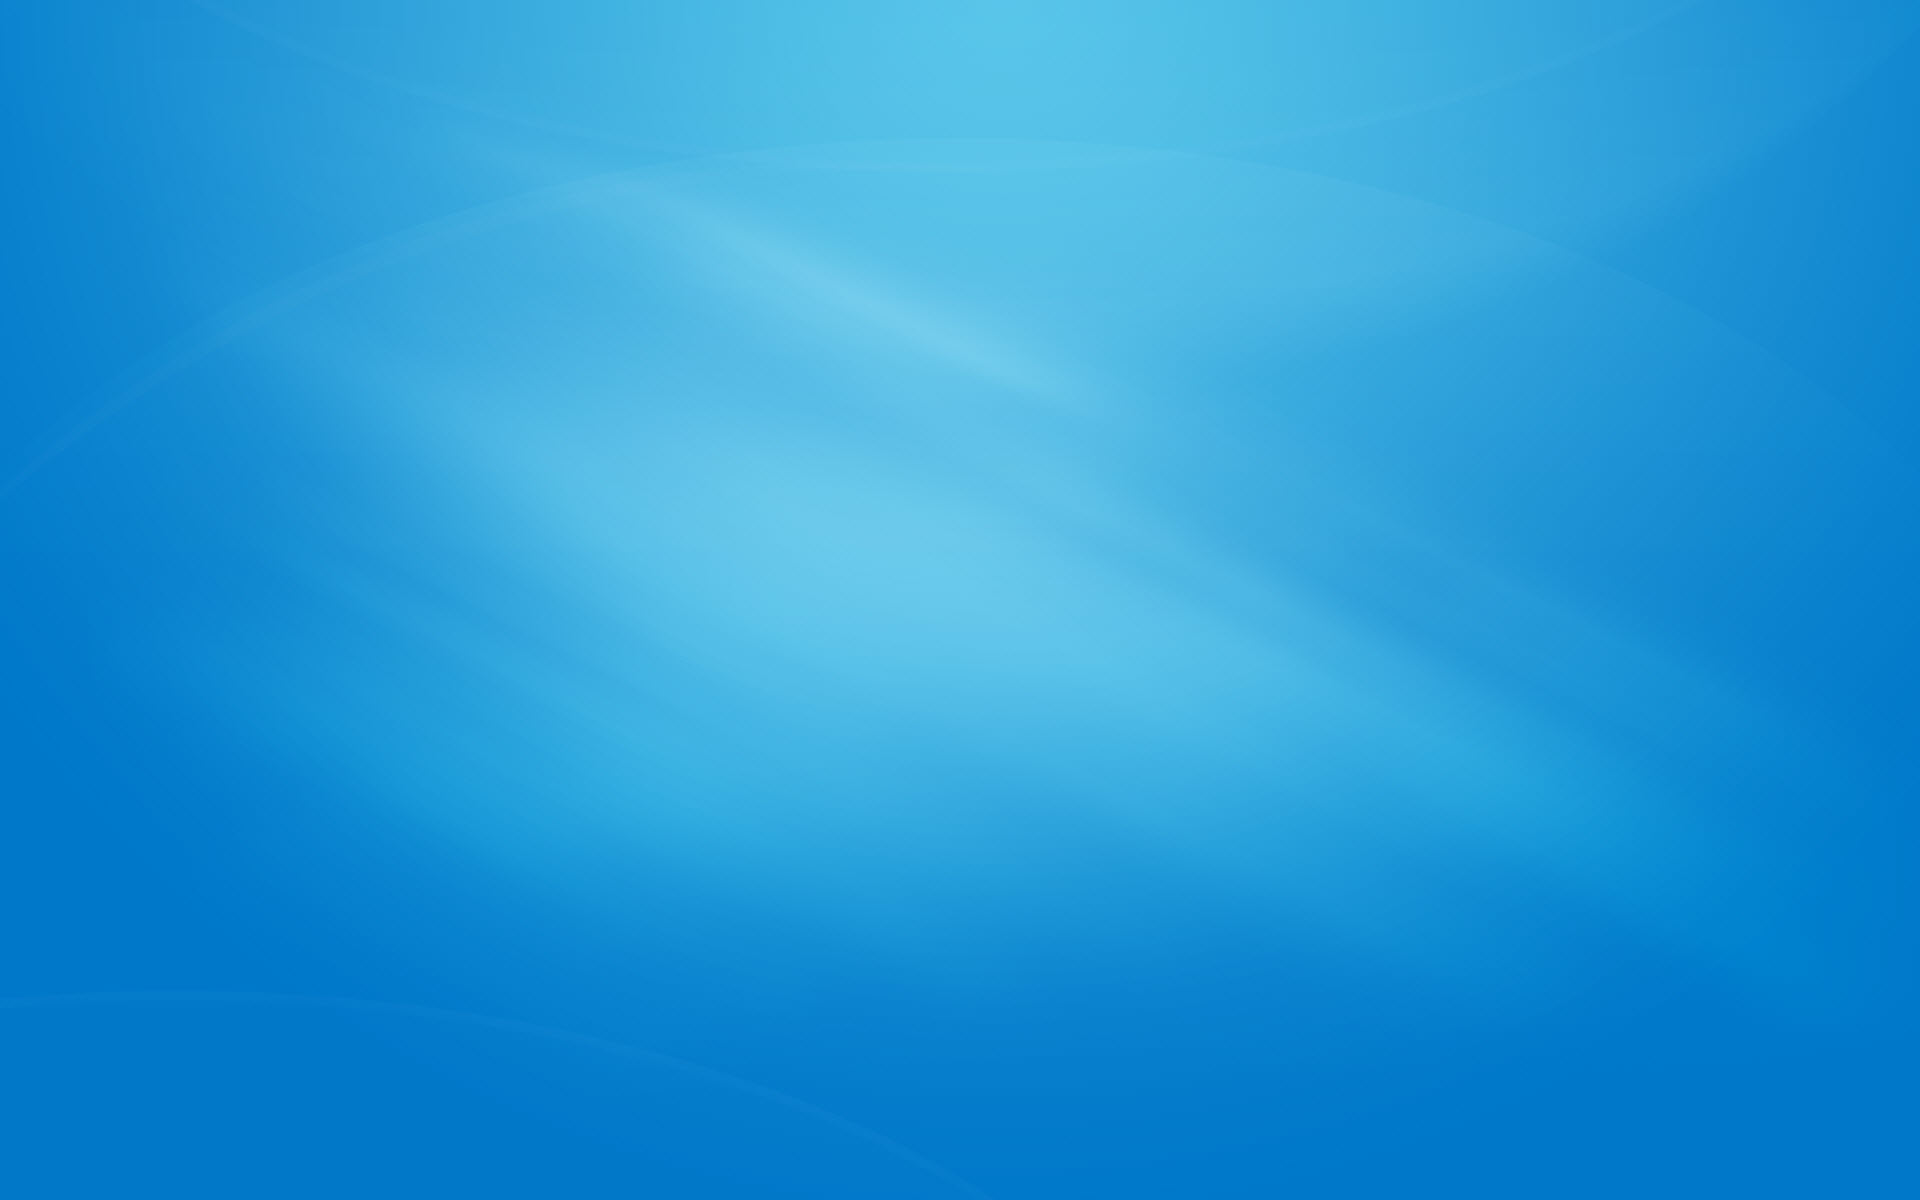 Hd Desktop Blue Wallpapers Wallpapers Hd